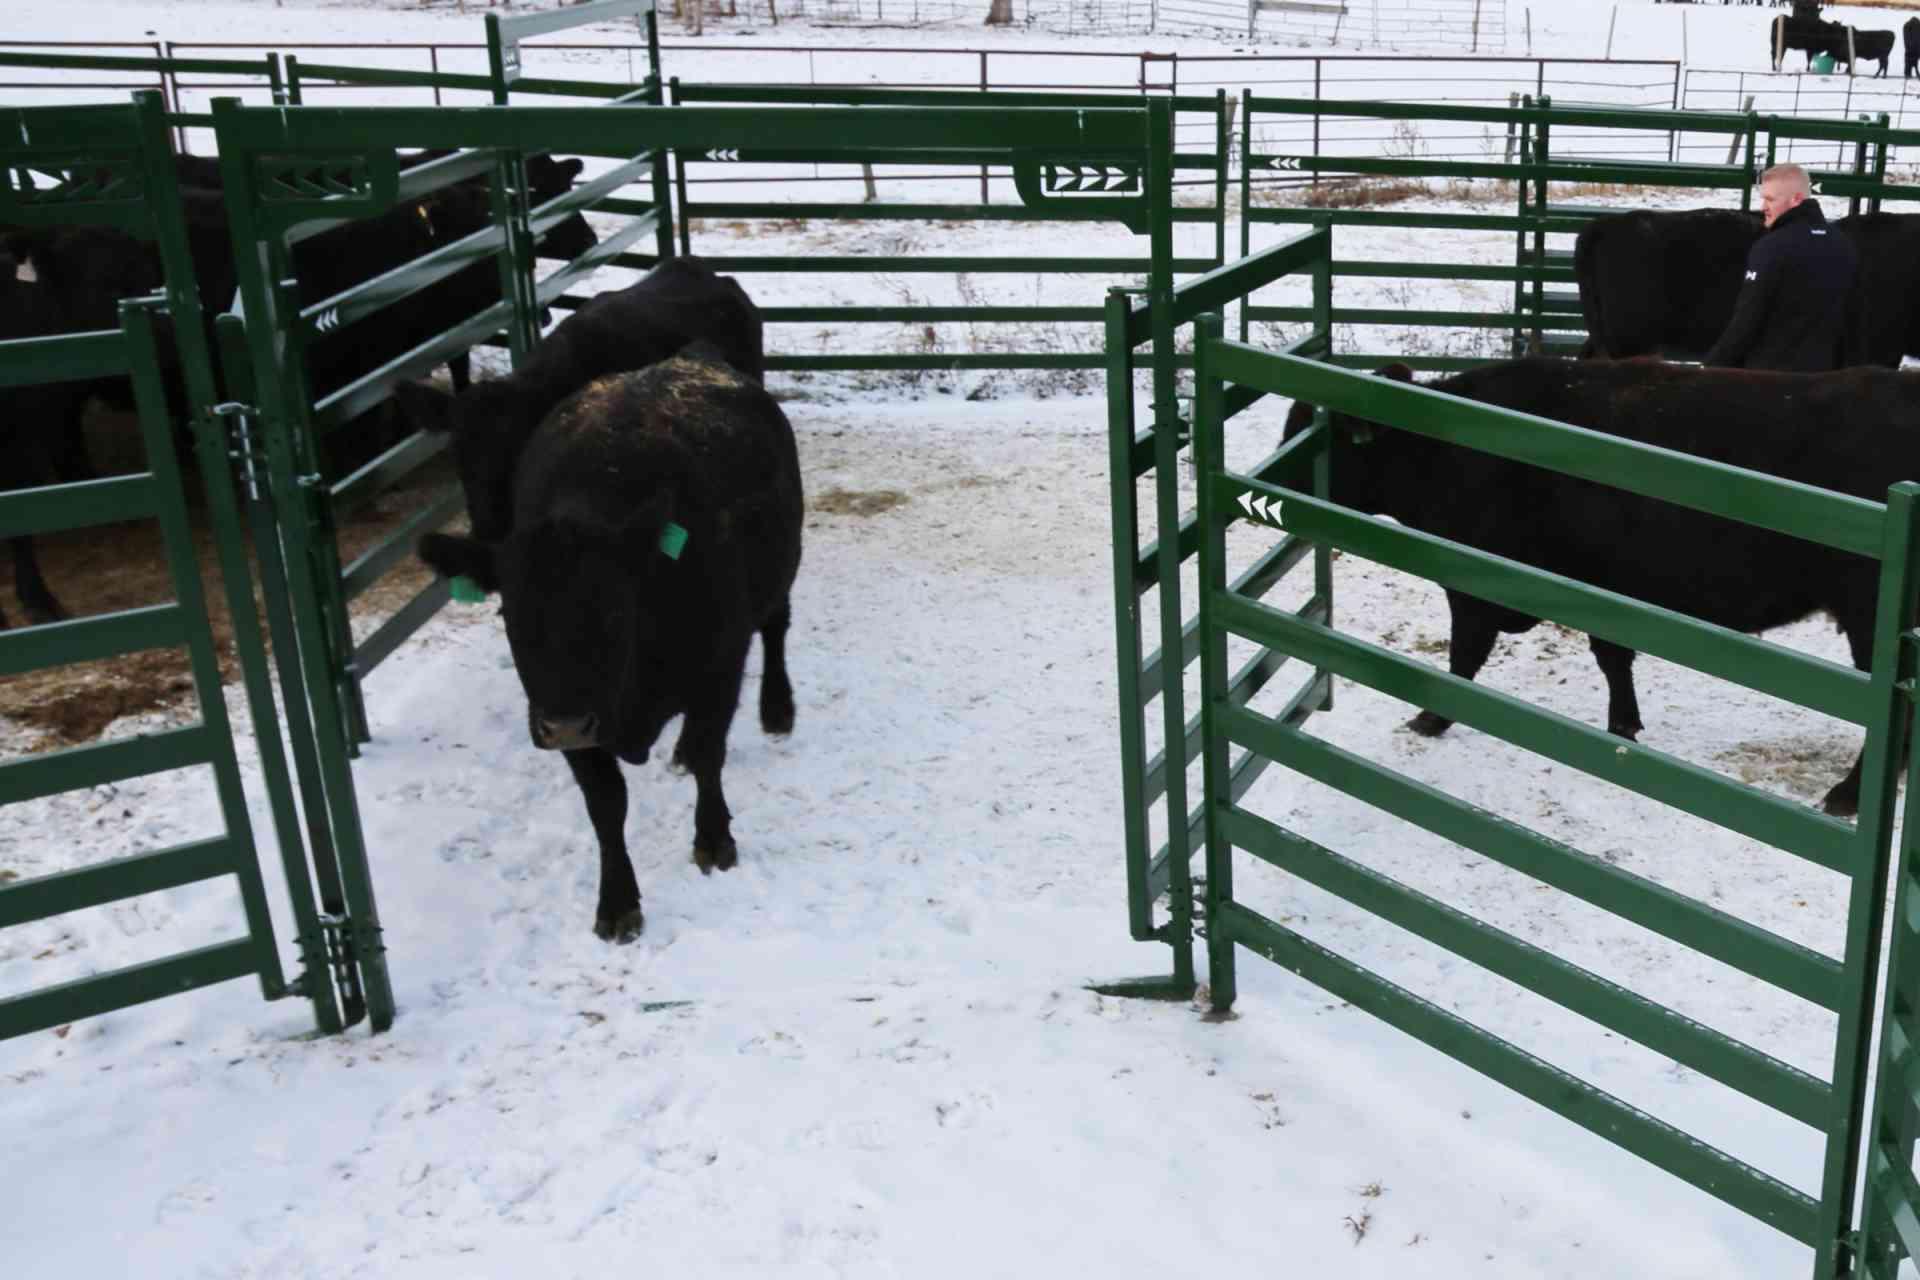 Black cow walking through Arrow Cattle Gate